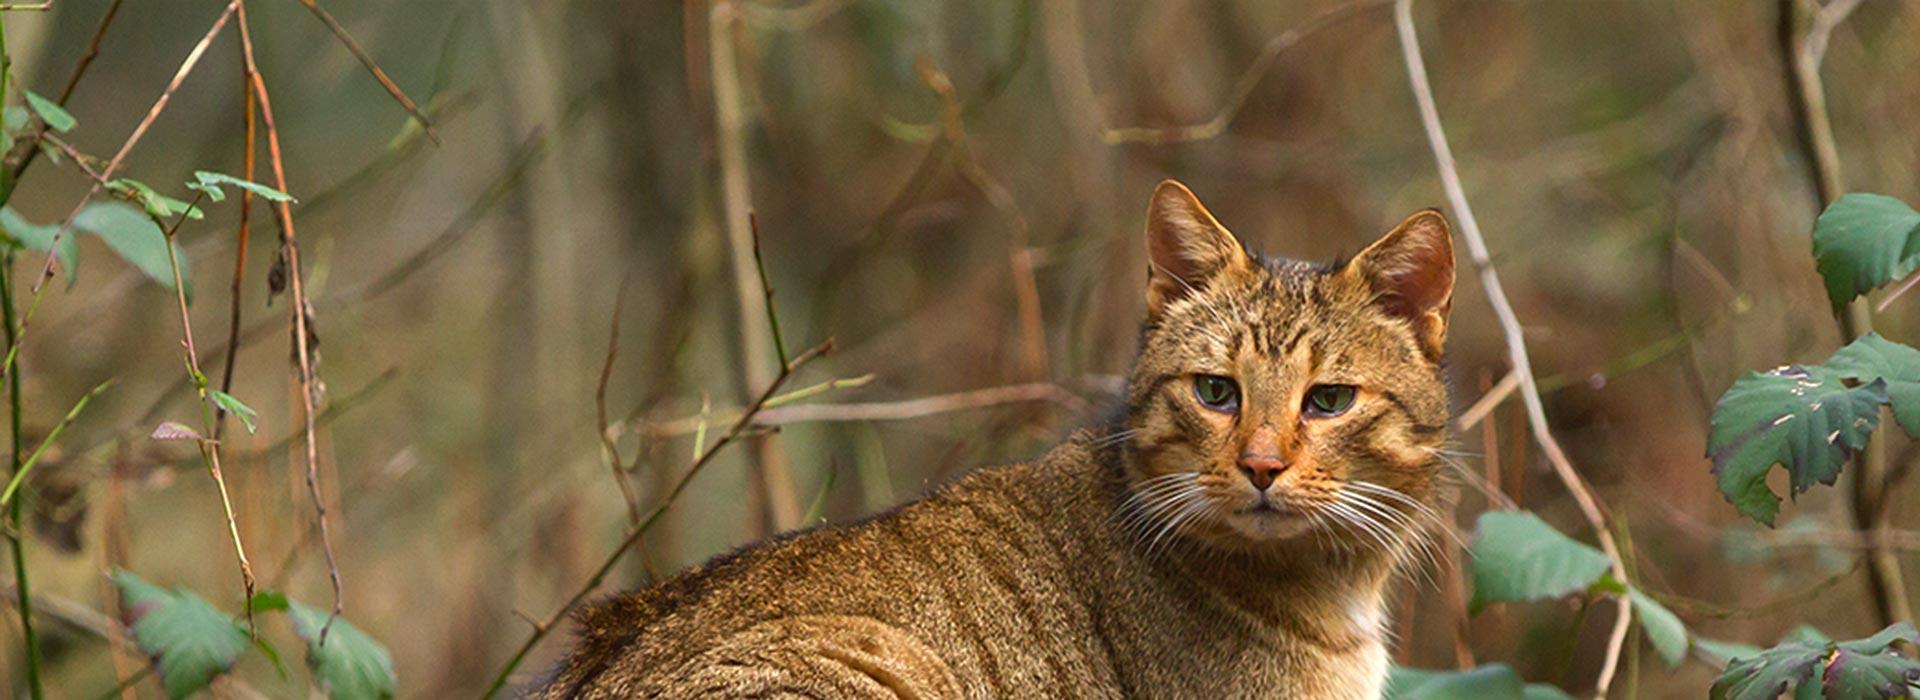 vitaly pienso natural de alta calidad para gatos slider